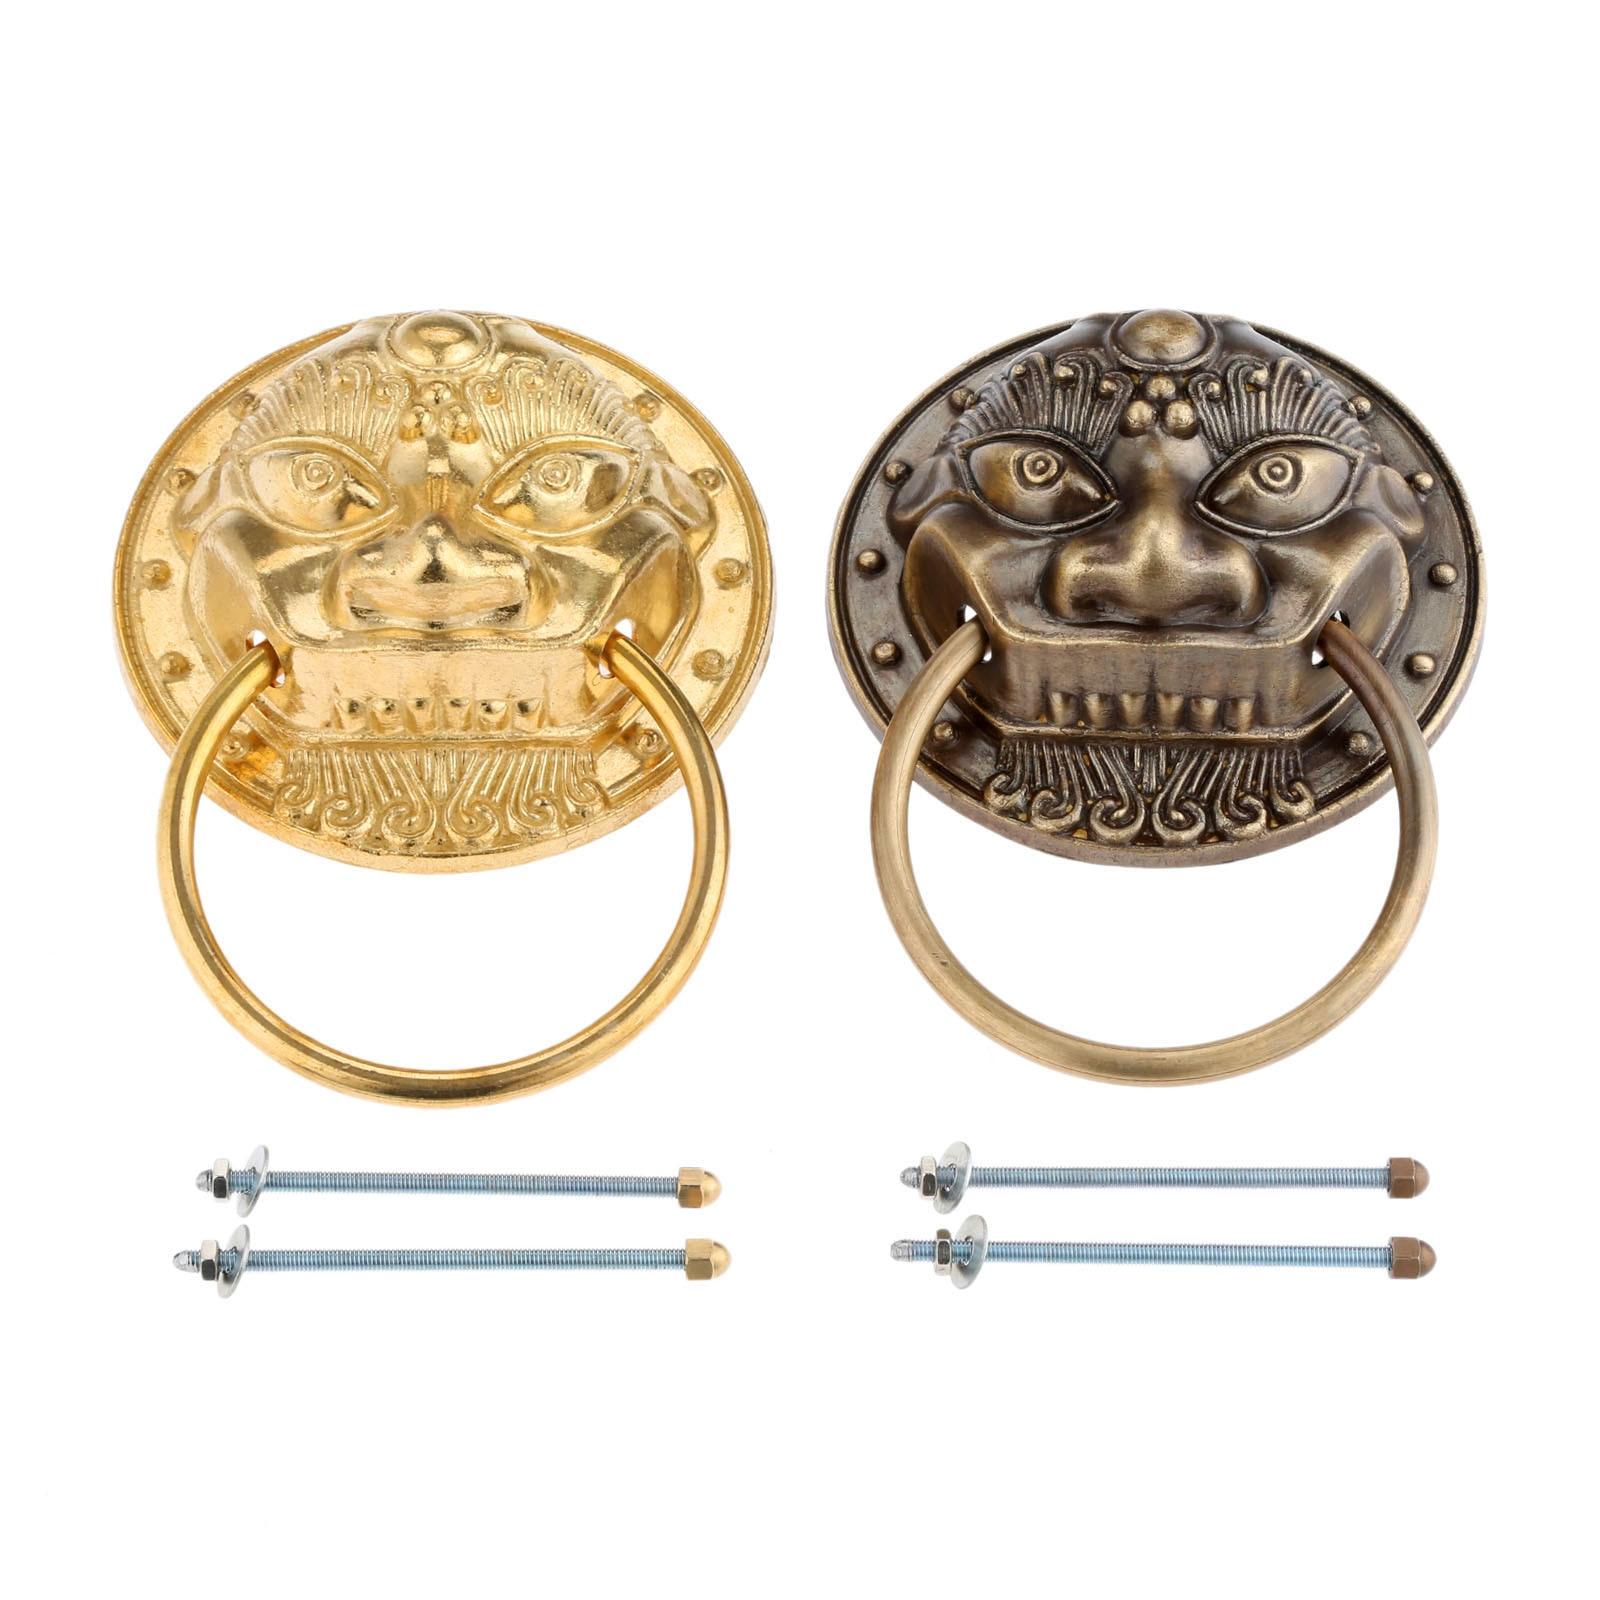 DRELD 1Pc 14cm Antique Brass Chinese Furniture Handle Pull Knocker Brass Hardware Vintage Lion Head Door Cabinet Pull Ring Knob